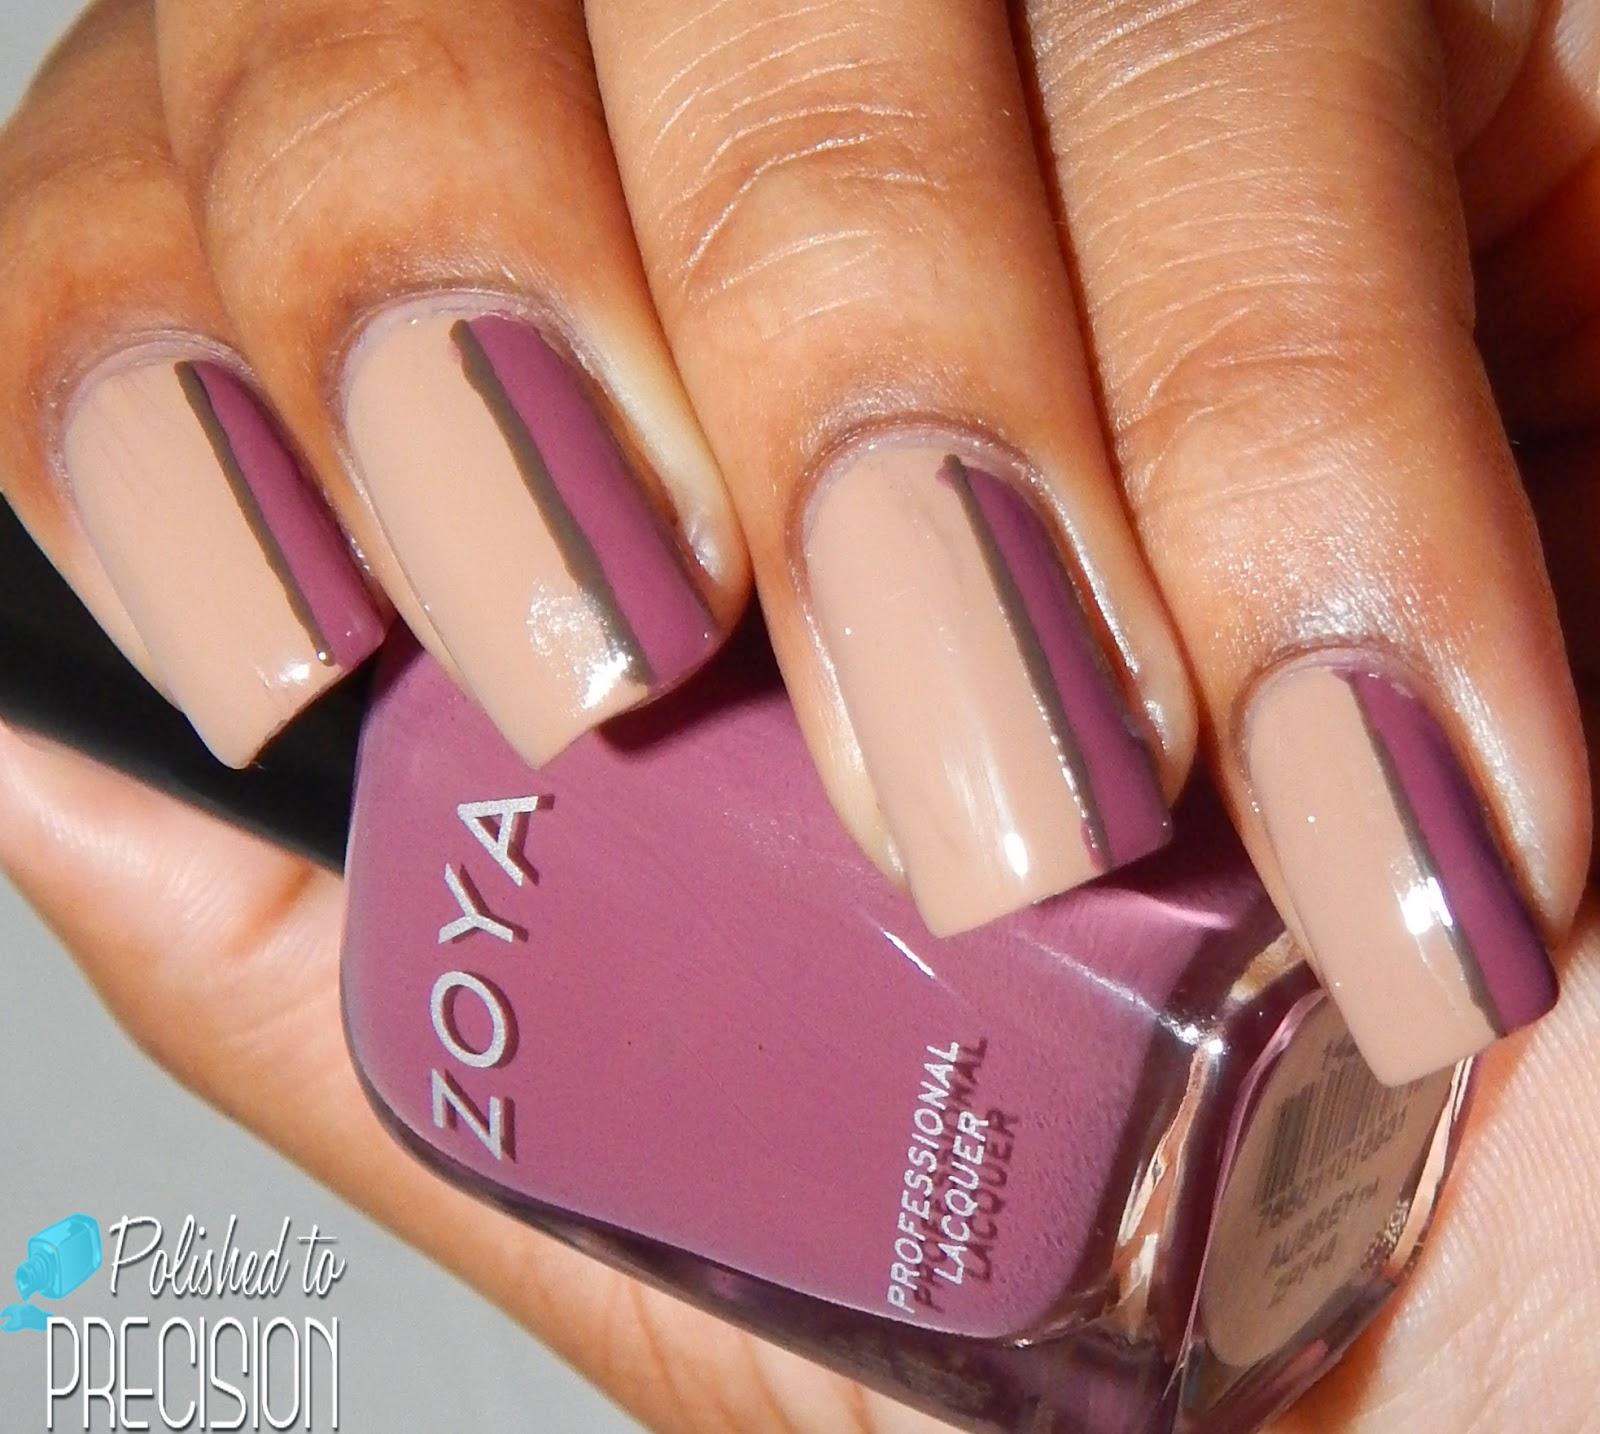 Zoya Naturel Deux Sideways French Manicure